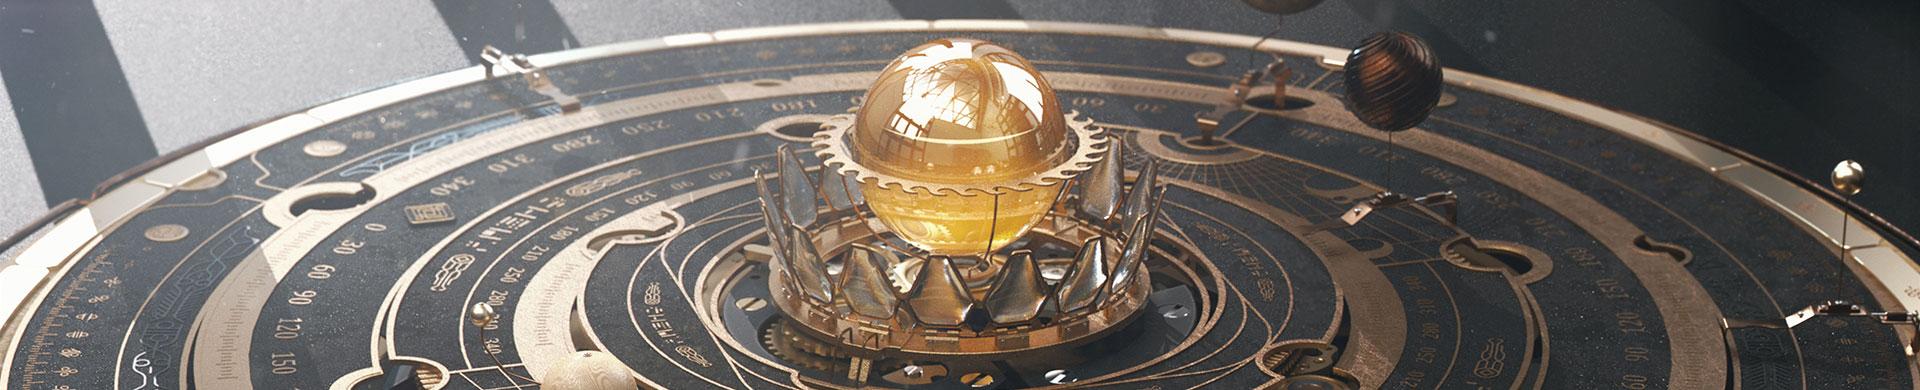 Orery Astrolabe